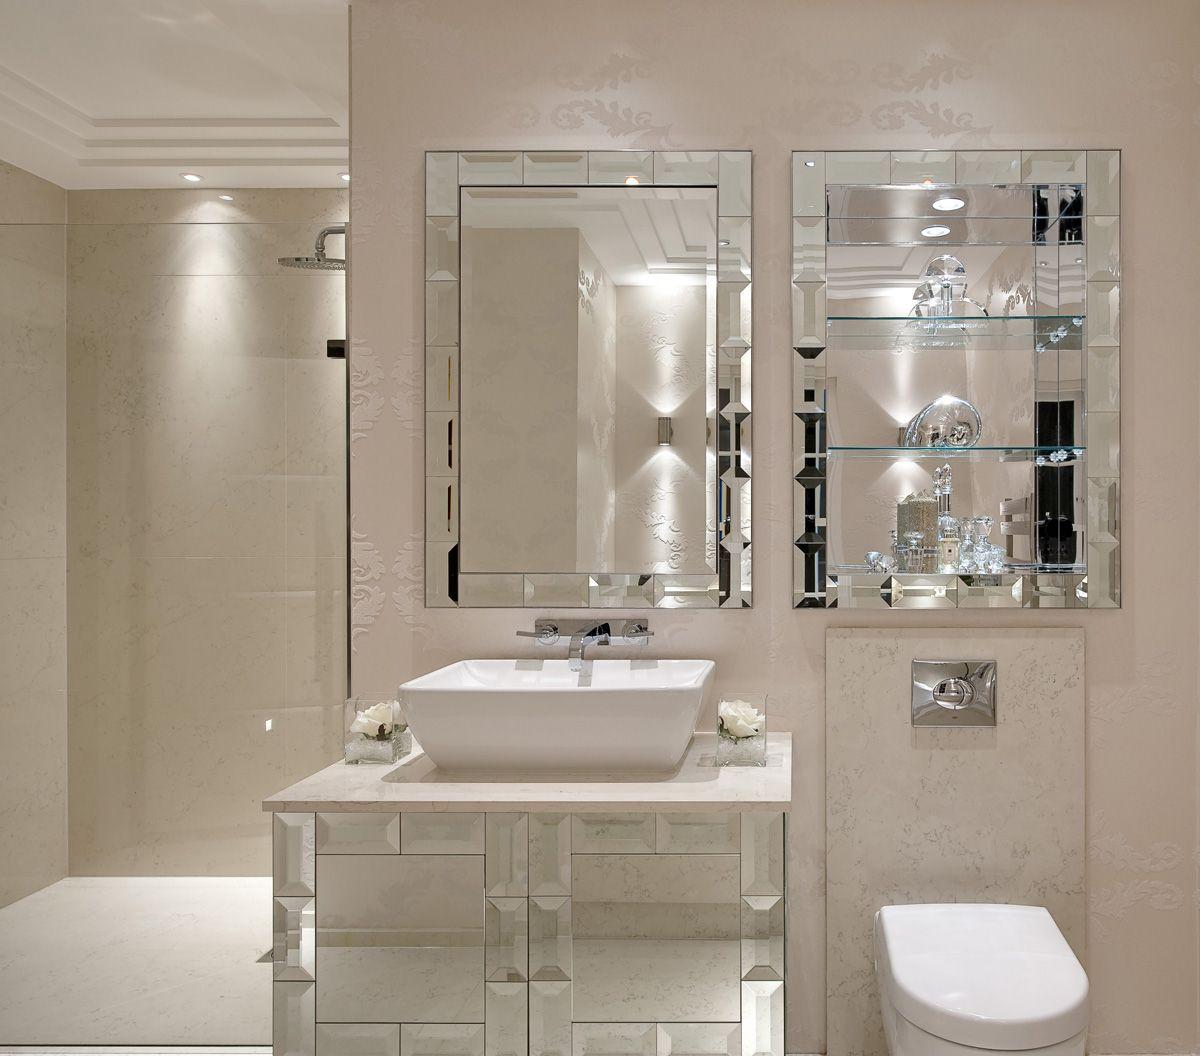 modern bathroom lighting luxury design. Lighting Design By John Cullen Lighting. Luxury BathroomsDream BathroomsModern Modern Bathroom